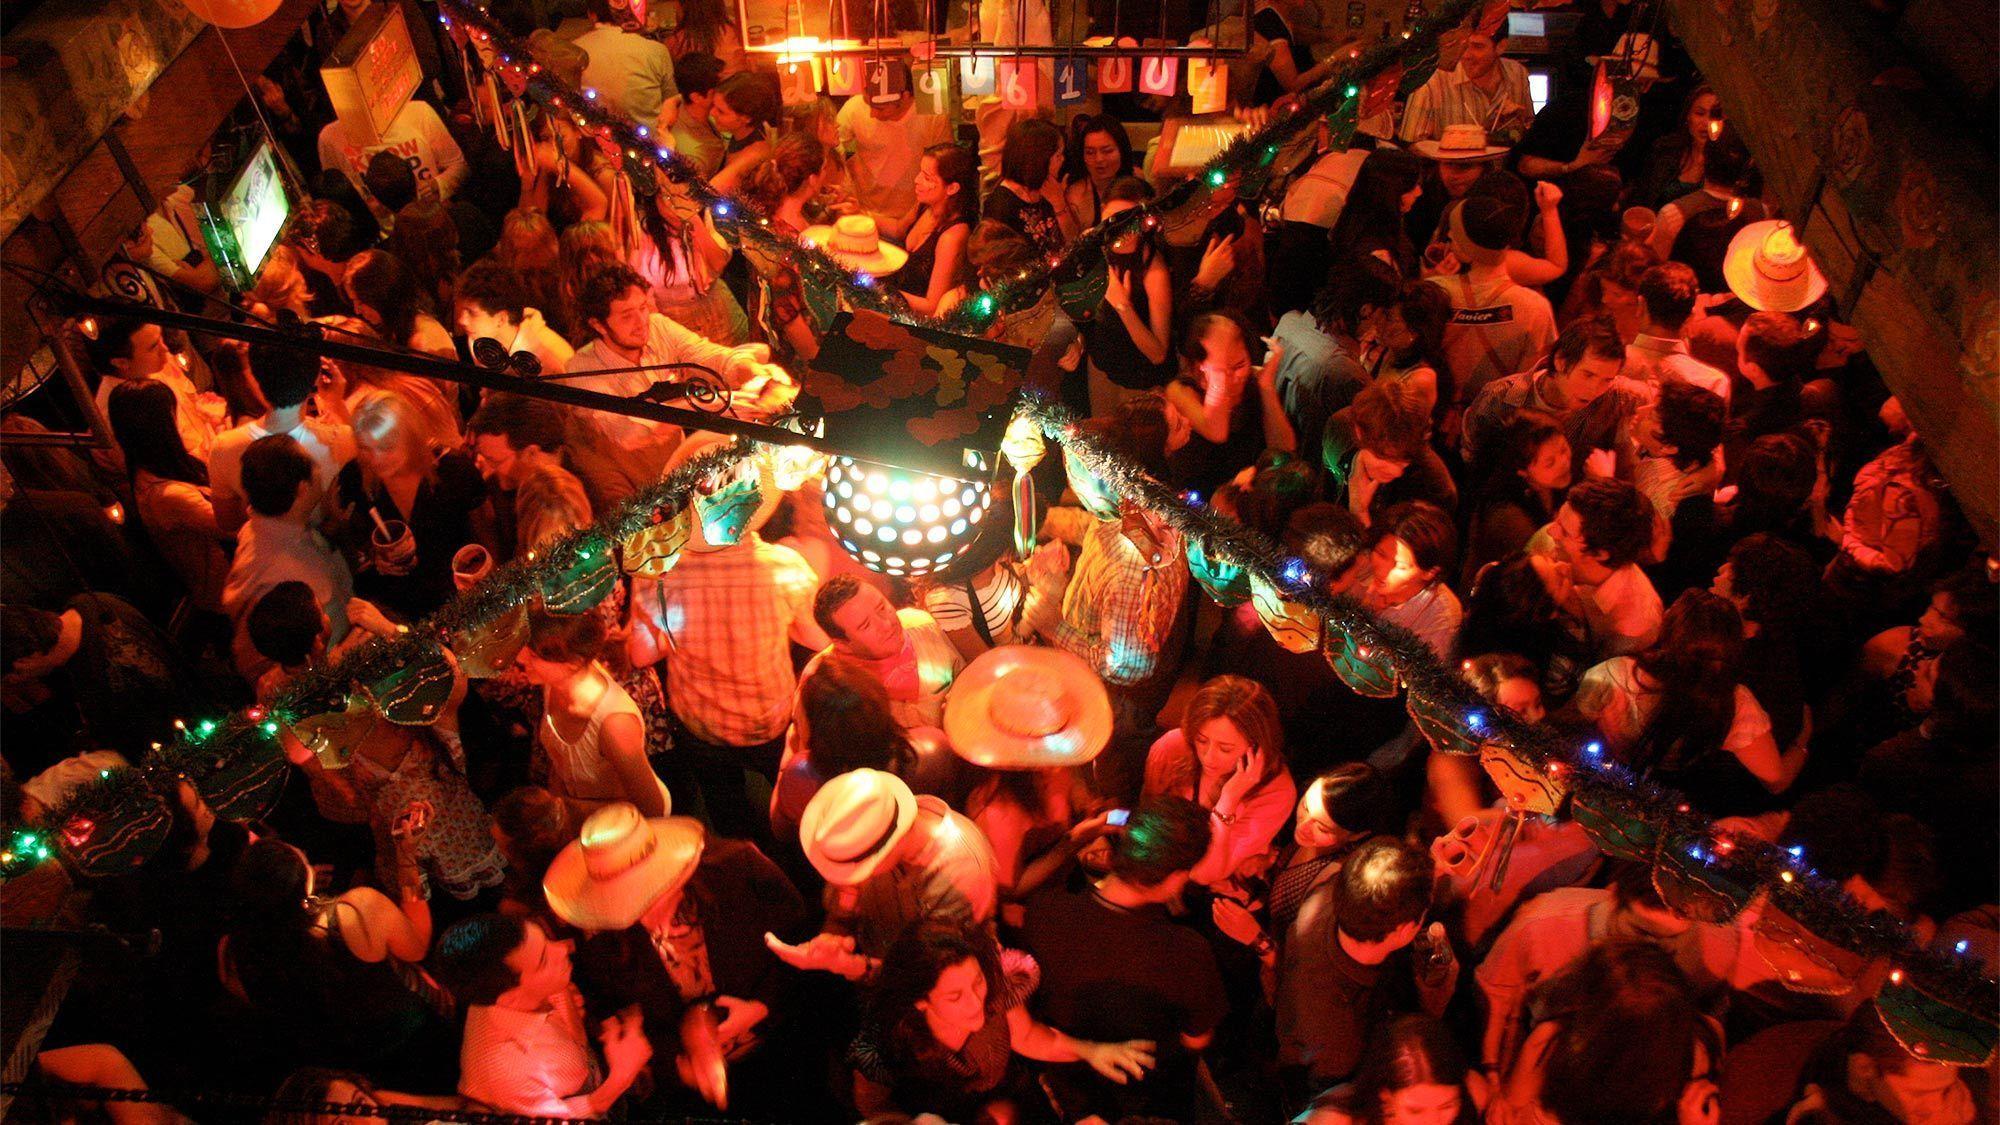 Andres Carne de Res restaurant-nightclub Andres Carne de Res in Bogota